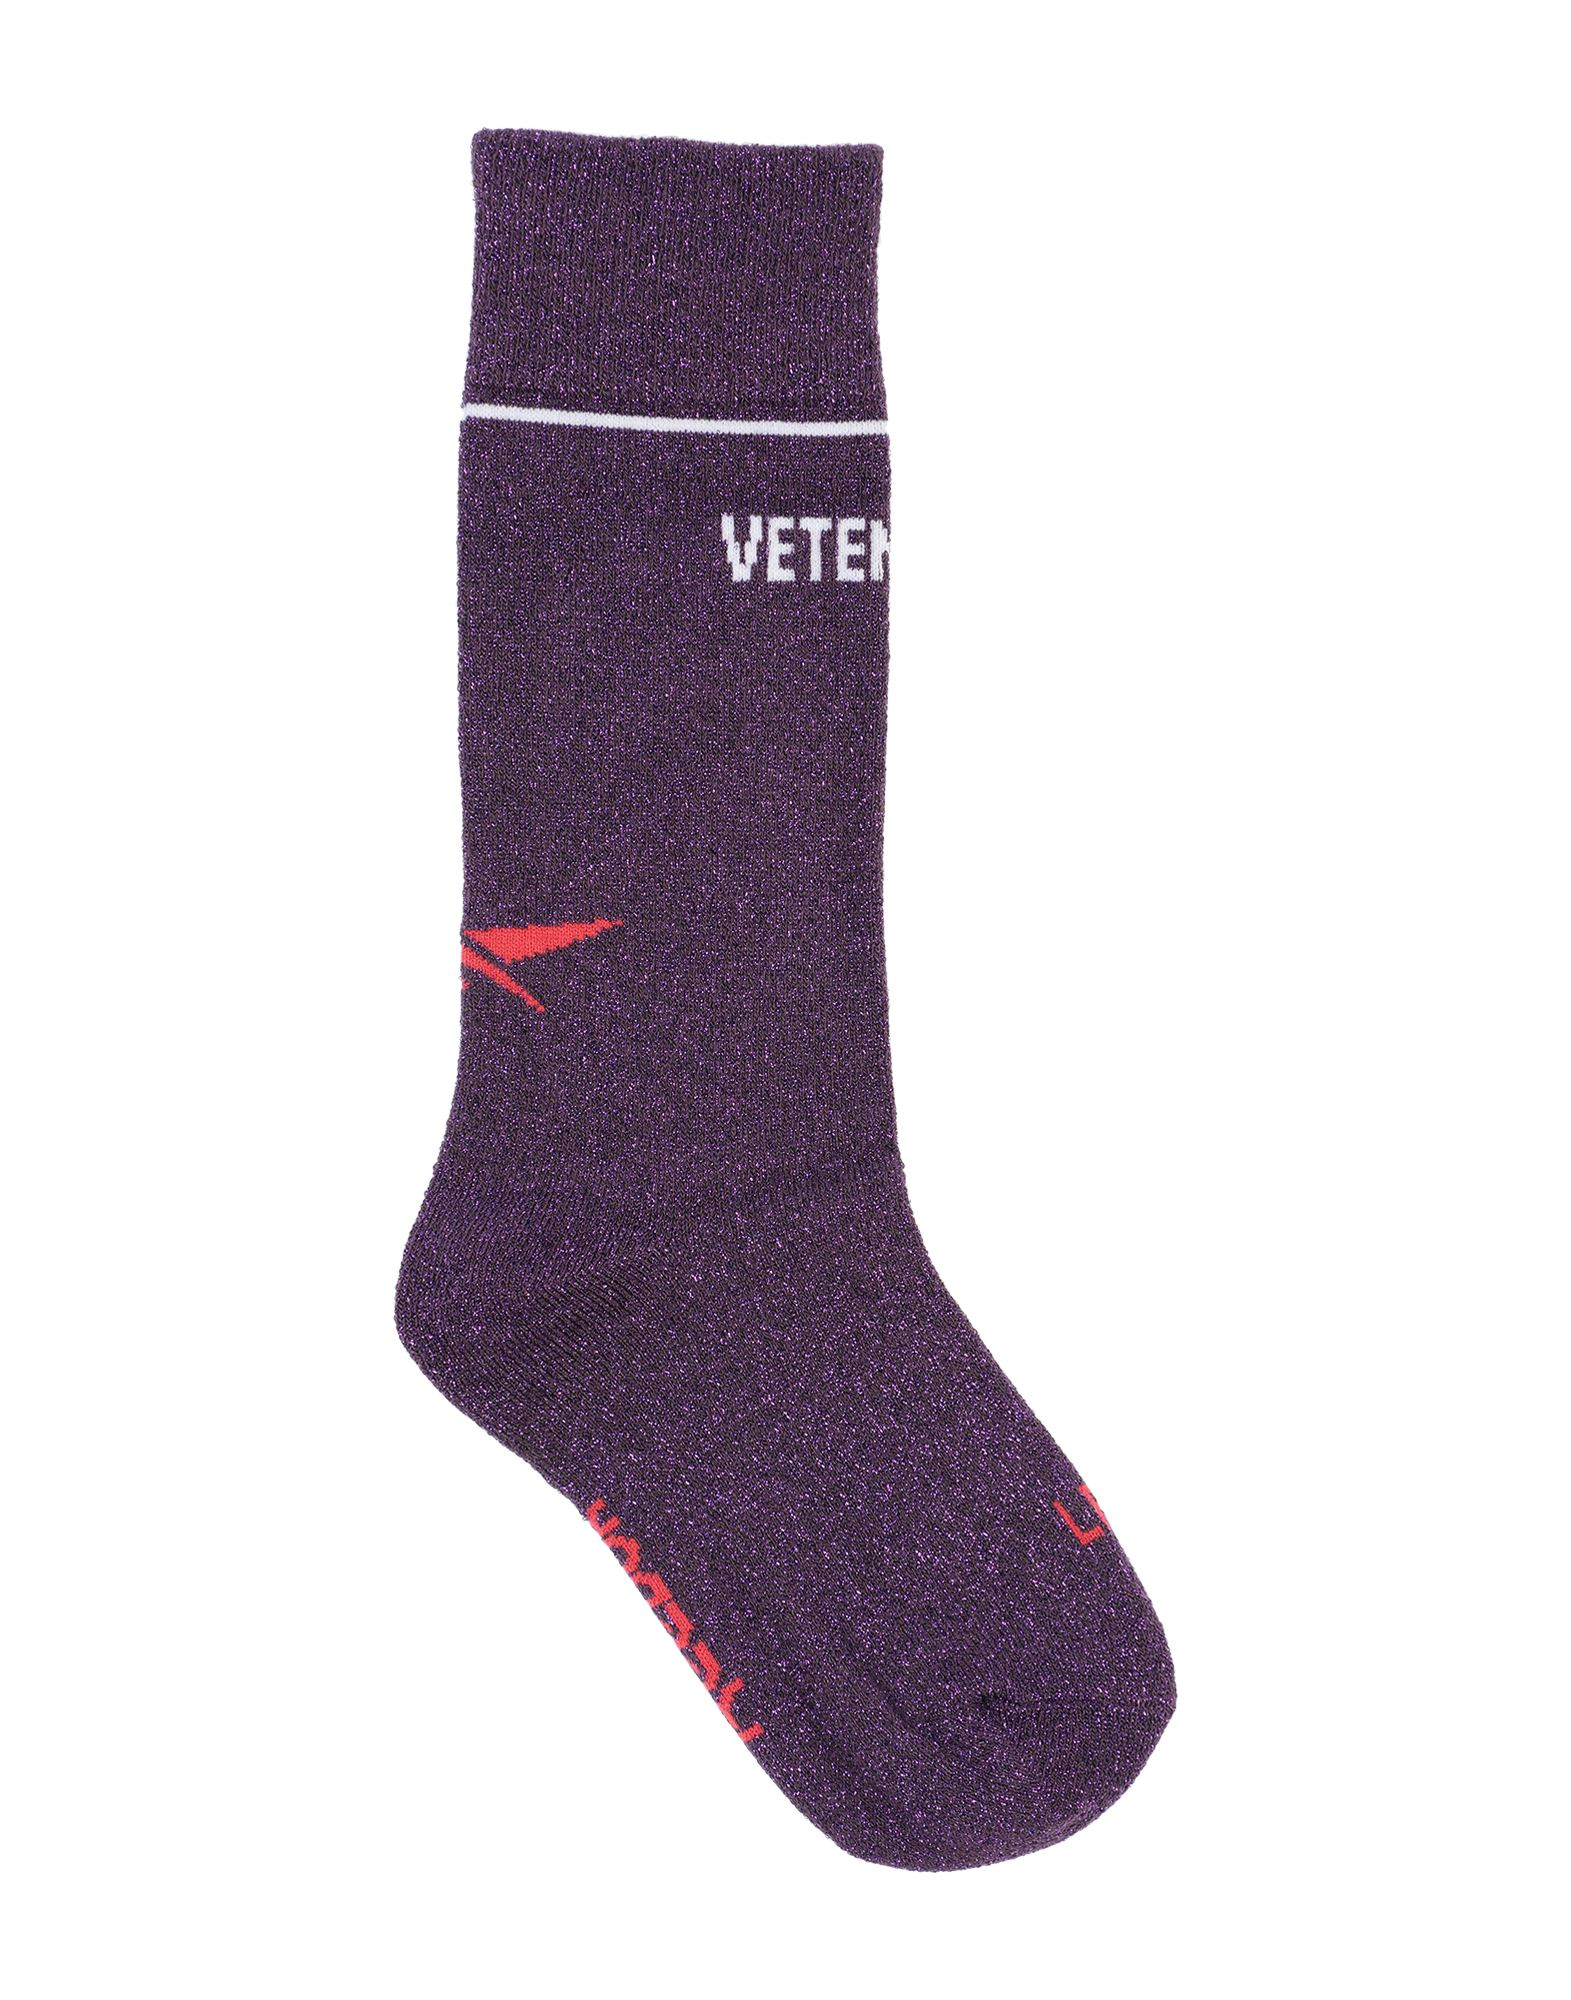 носки reebok act fon inside sock 3p цвет белый du2987 размер 47 49 REEBOK Короткие носки